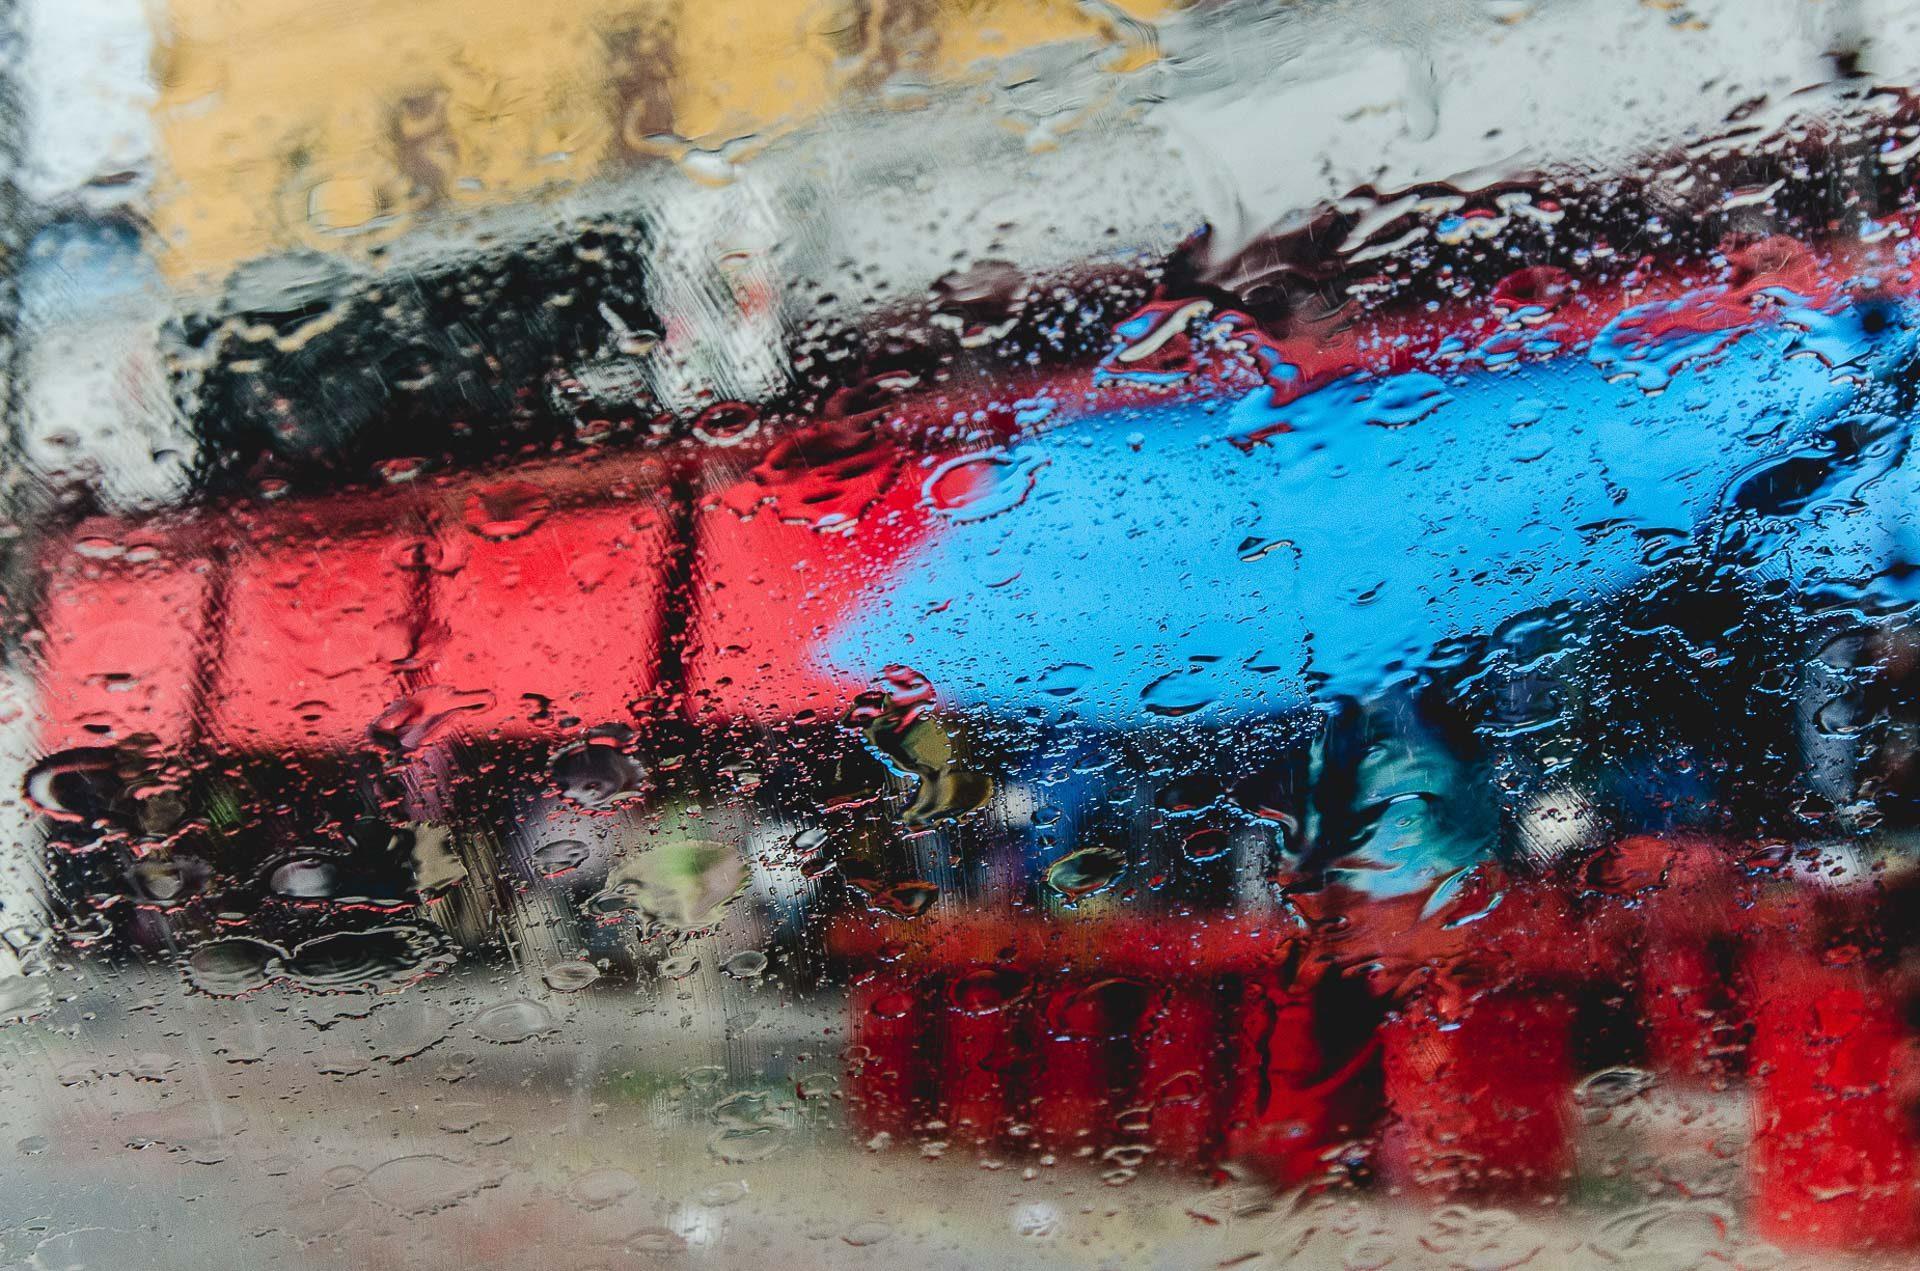 Chuva em Belém